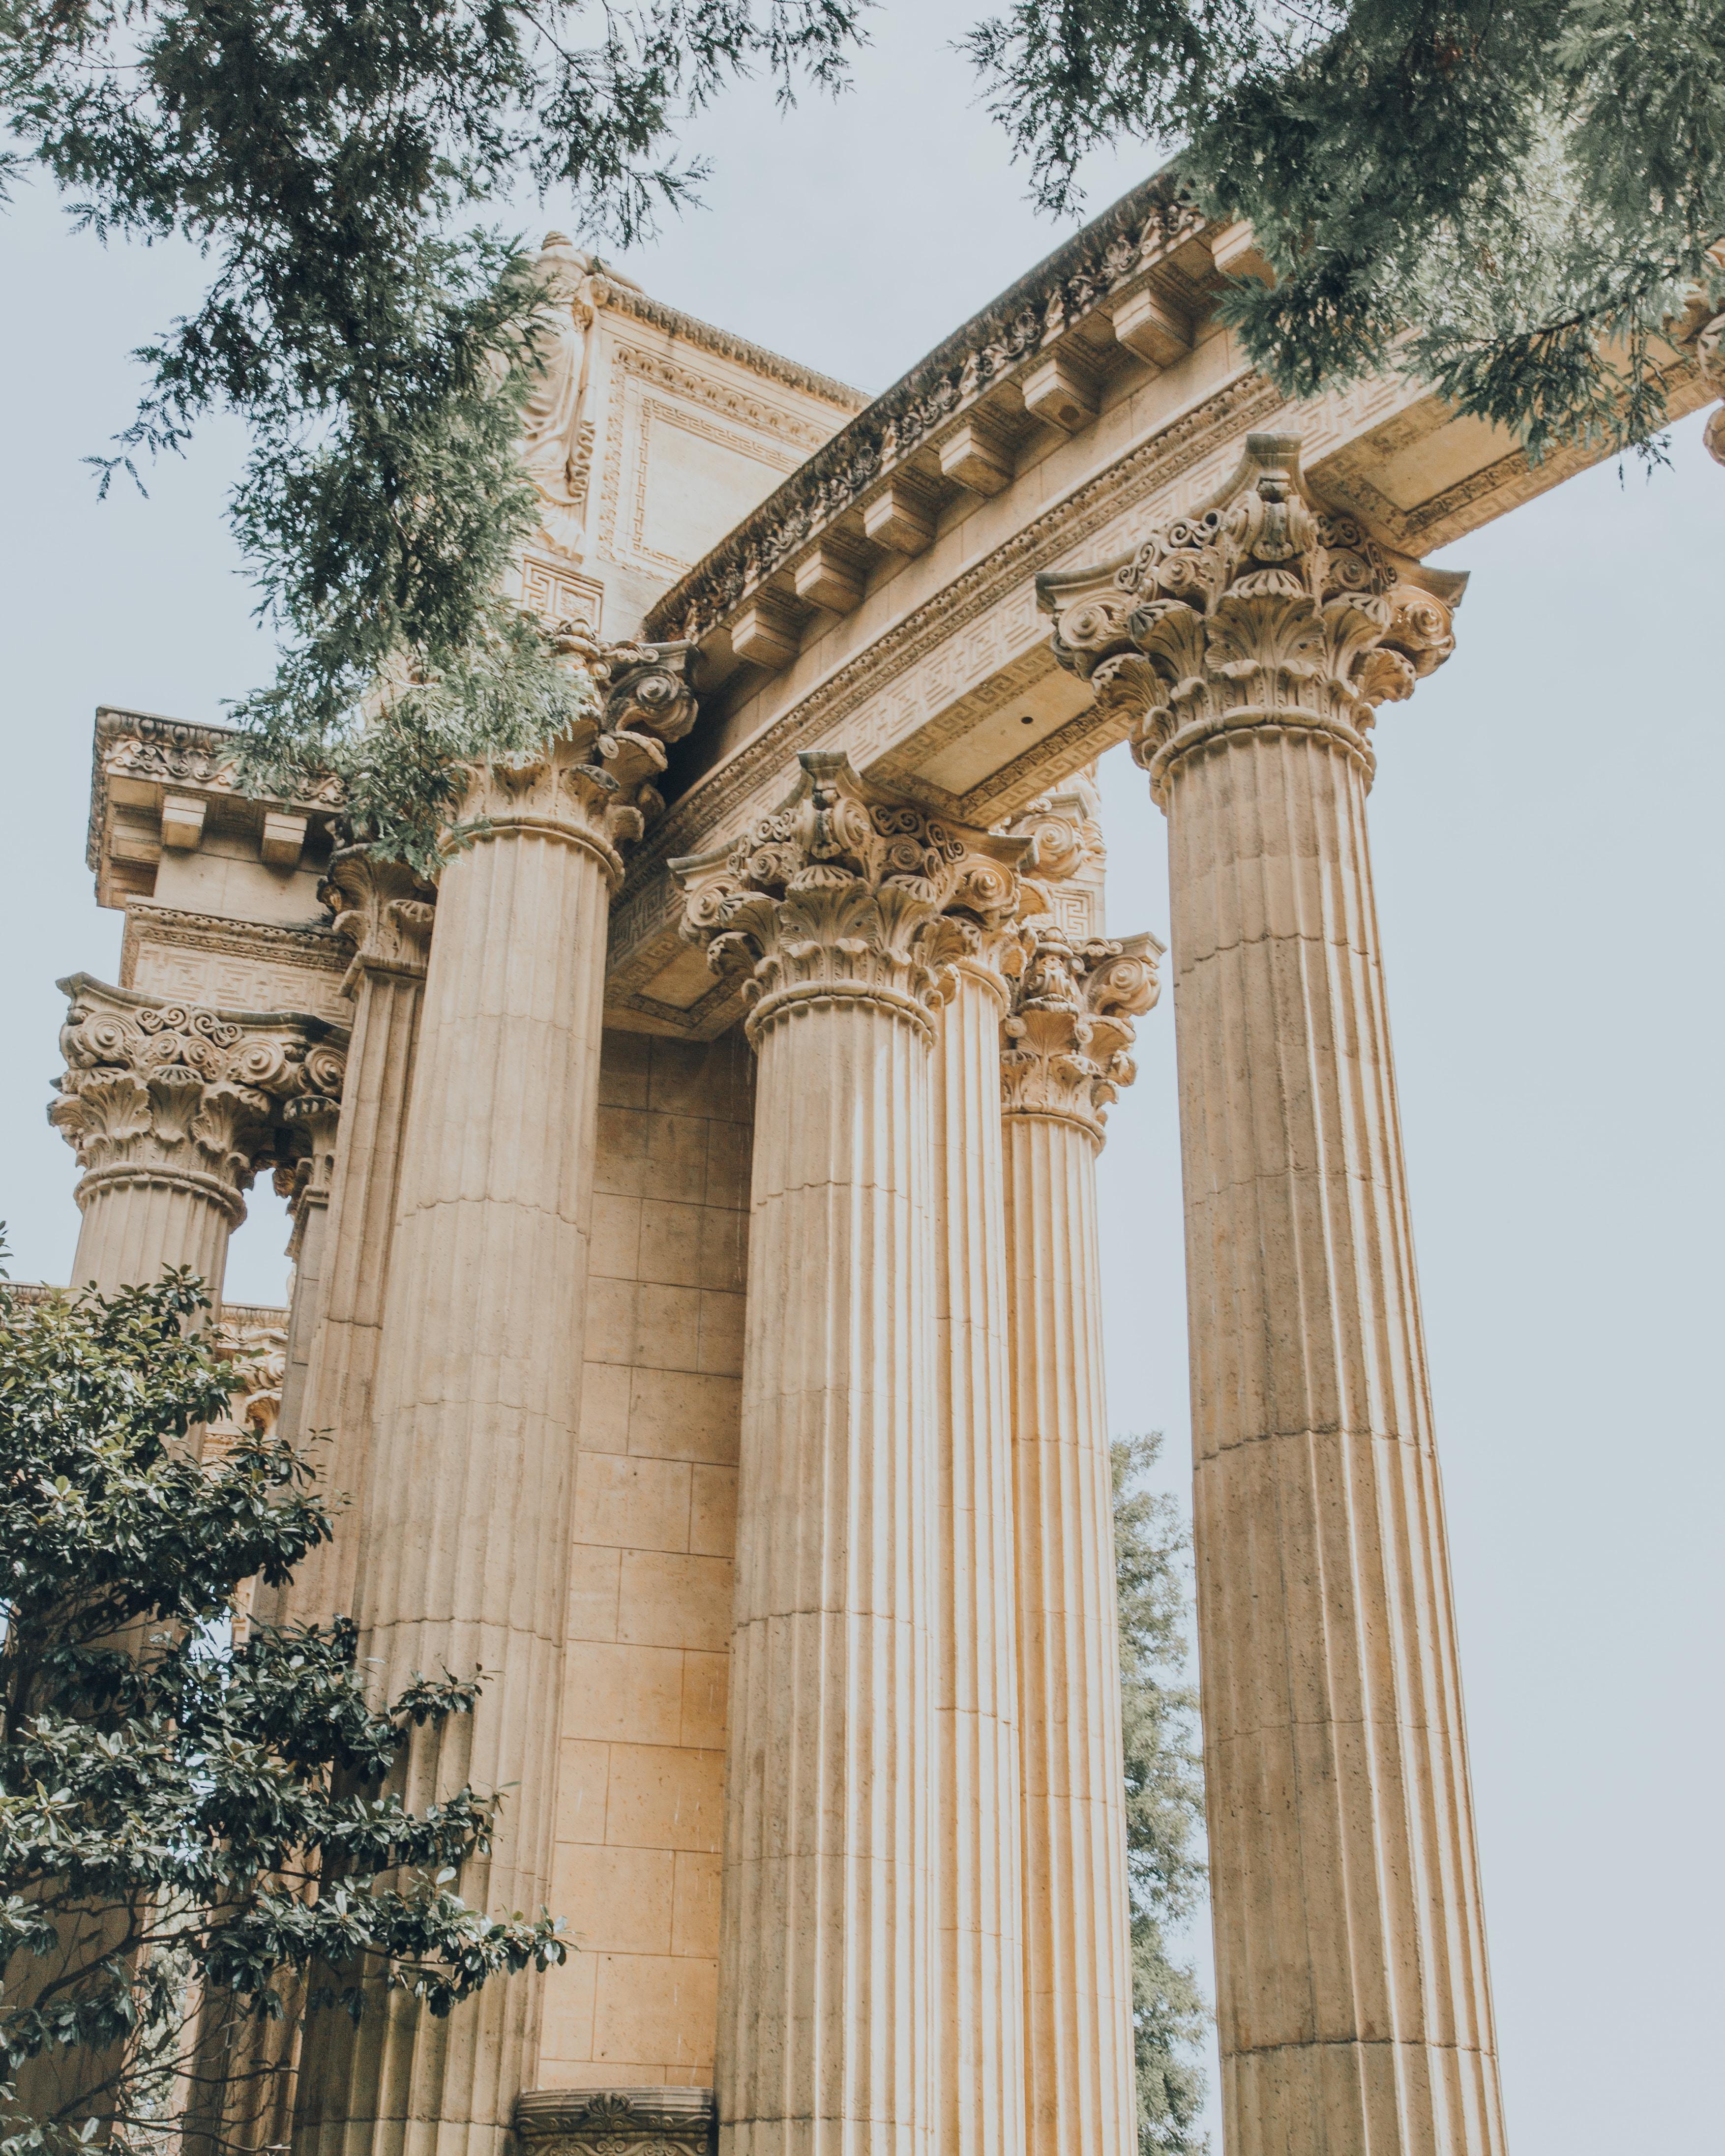 brown columns near trees under clear sky